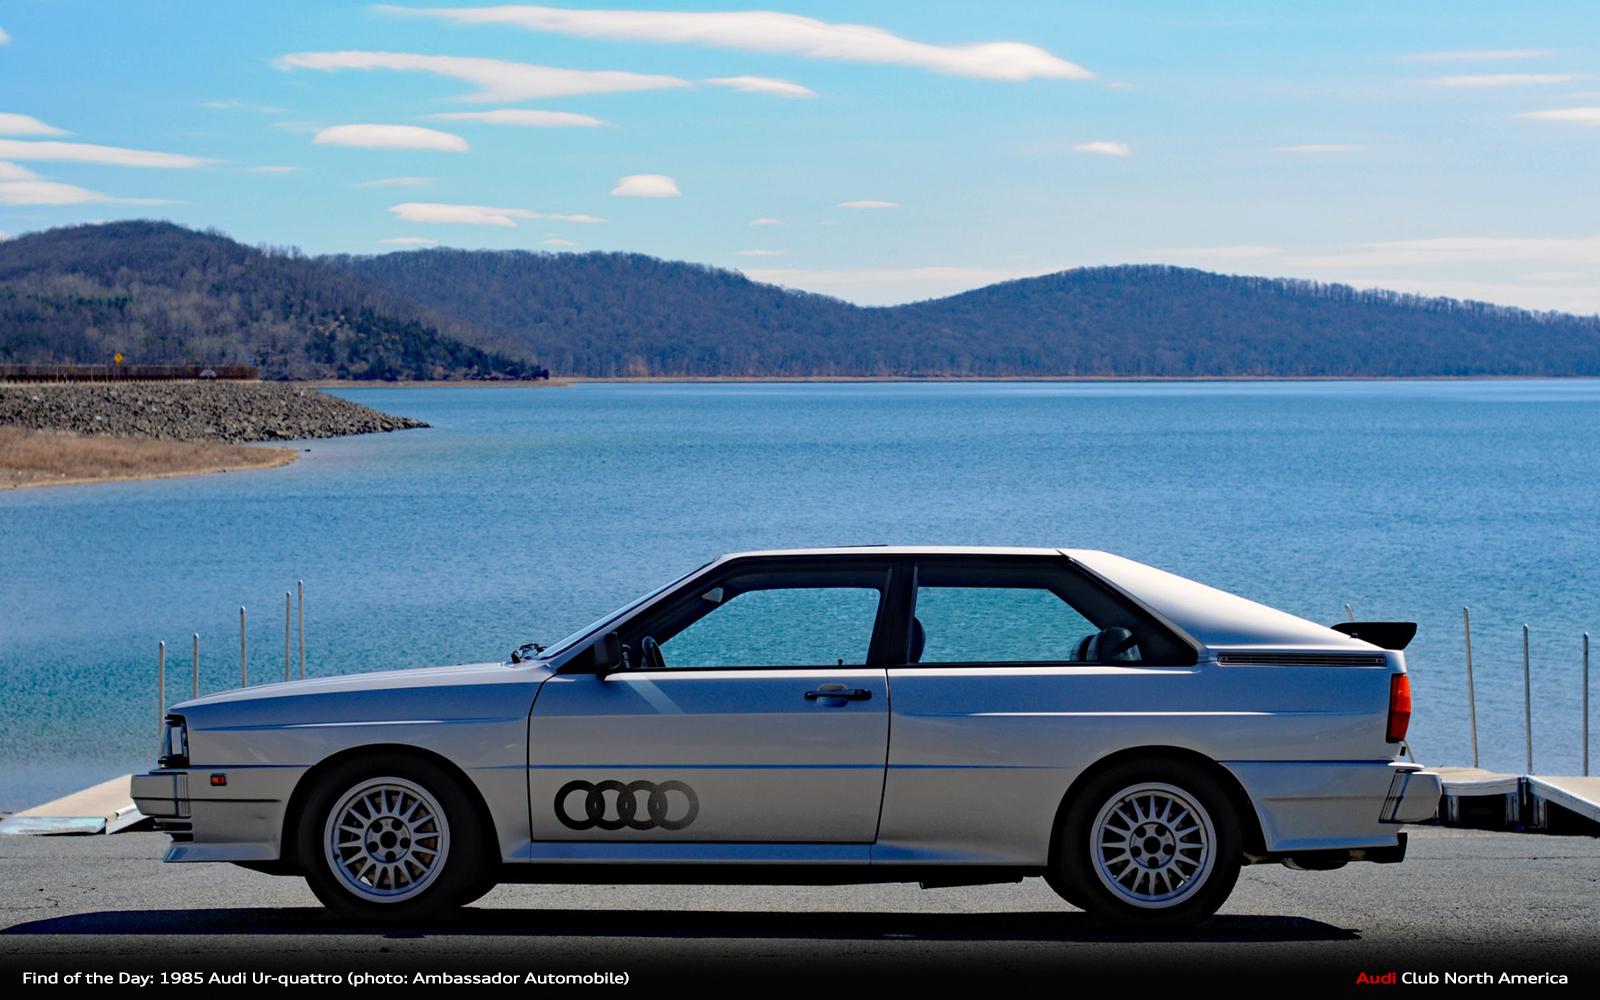 Find of the Day 1985 Zermatt Silver Audi Ur,quattro , Audi